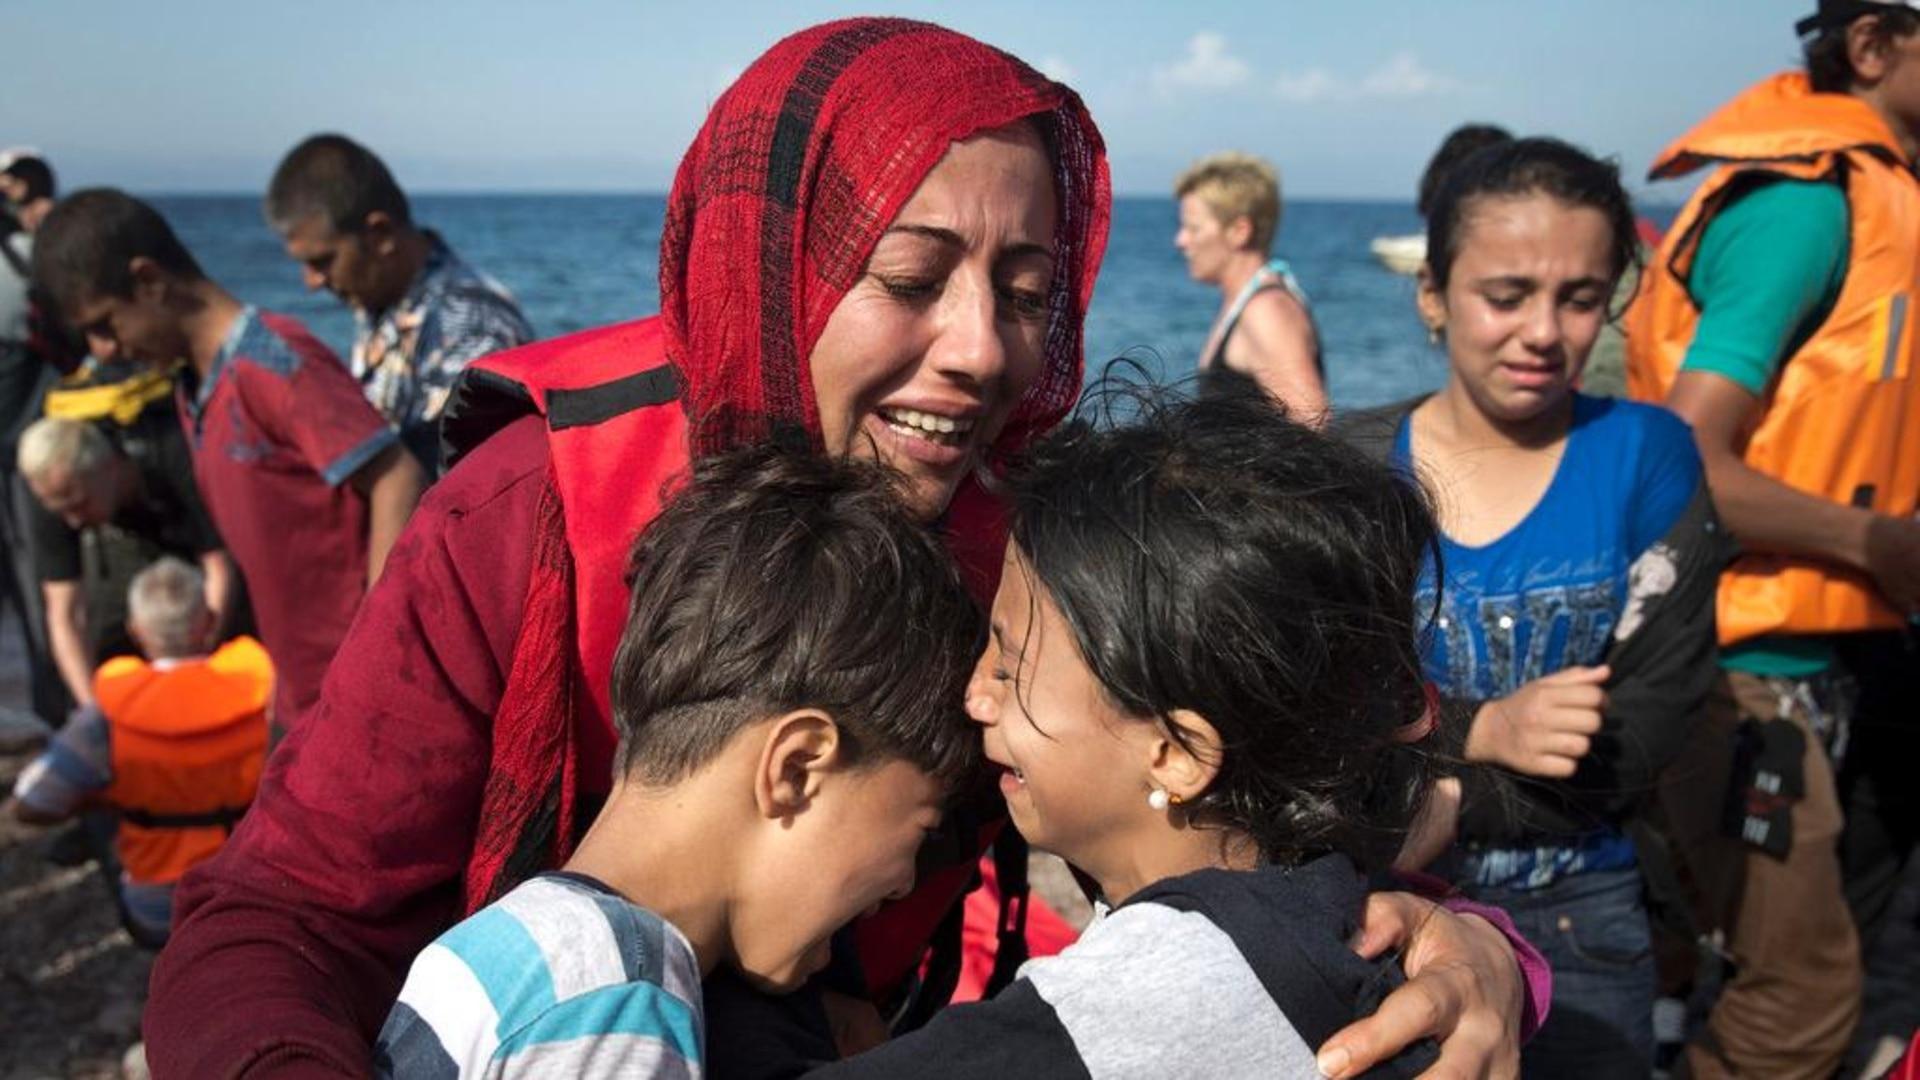 EU accuses Syrian regime of atrocities - Ya Libnan